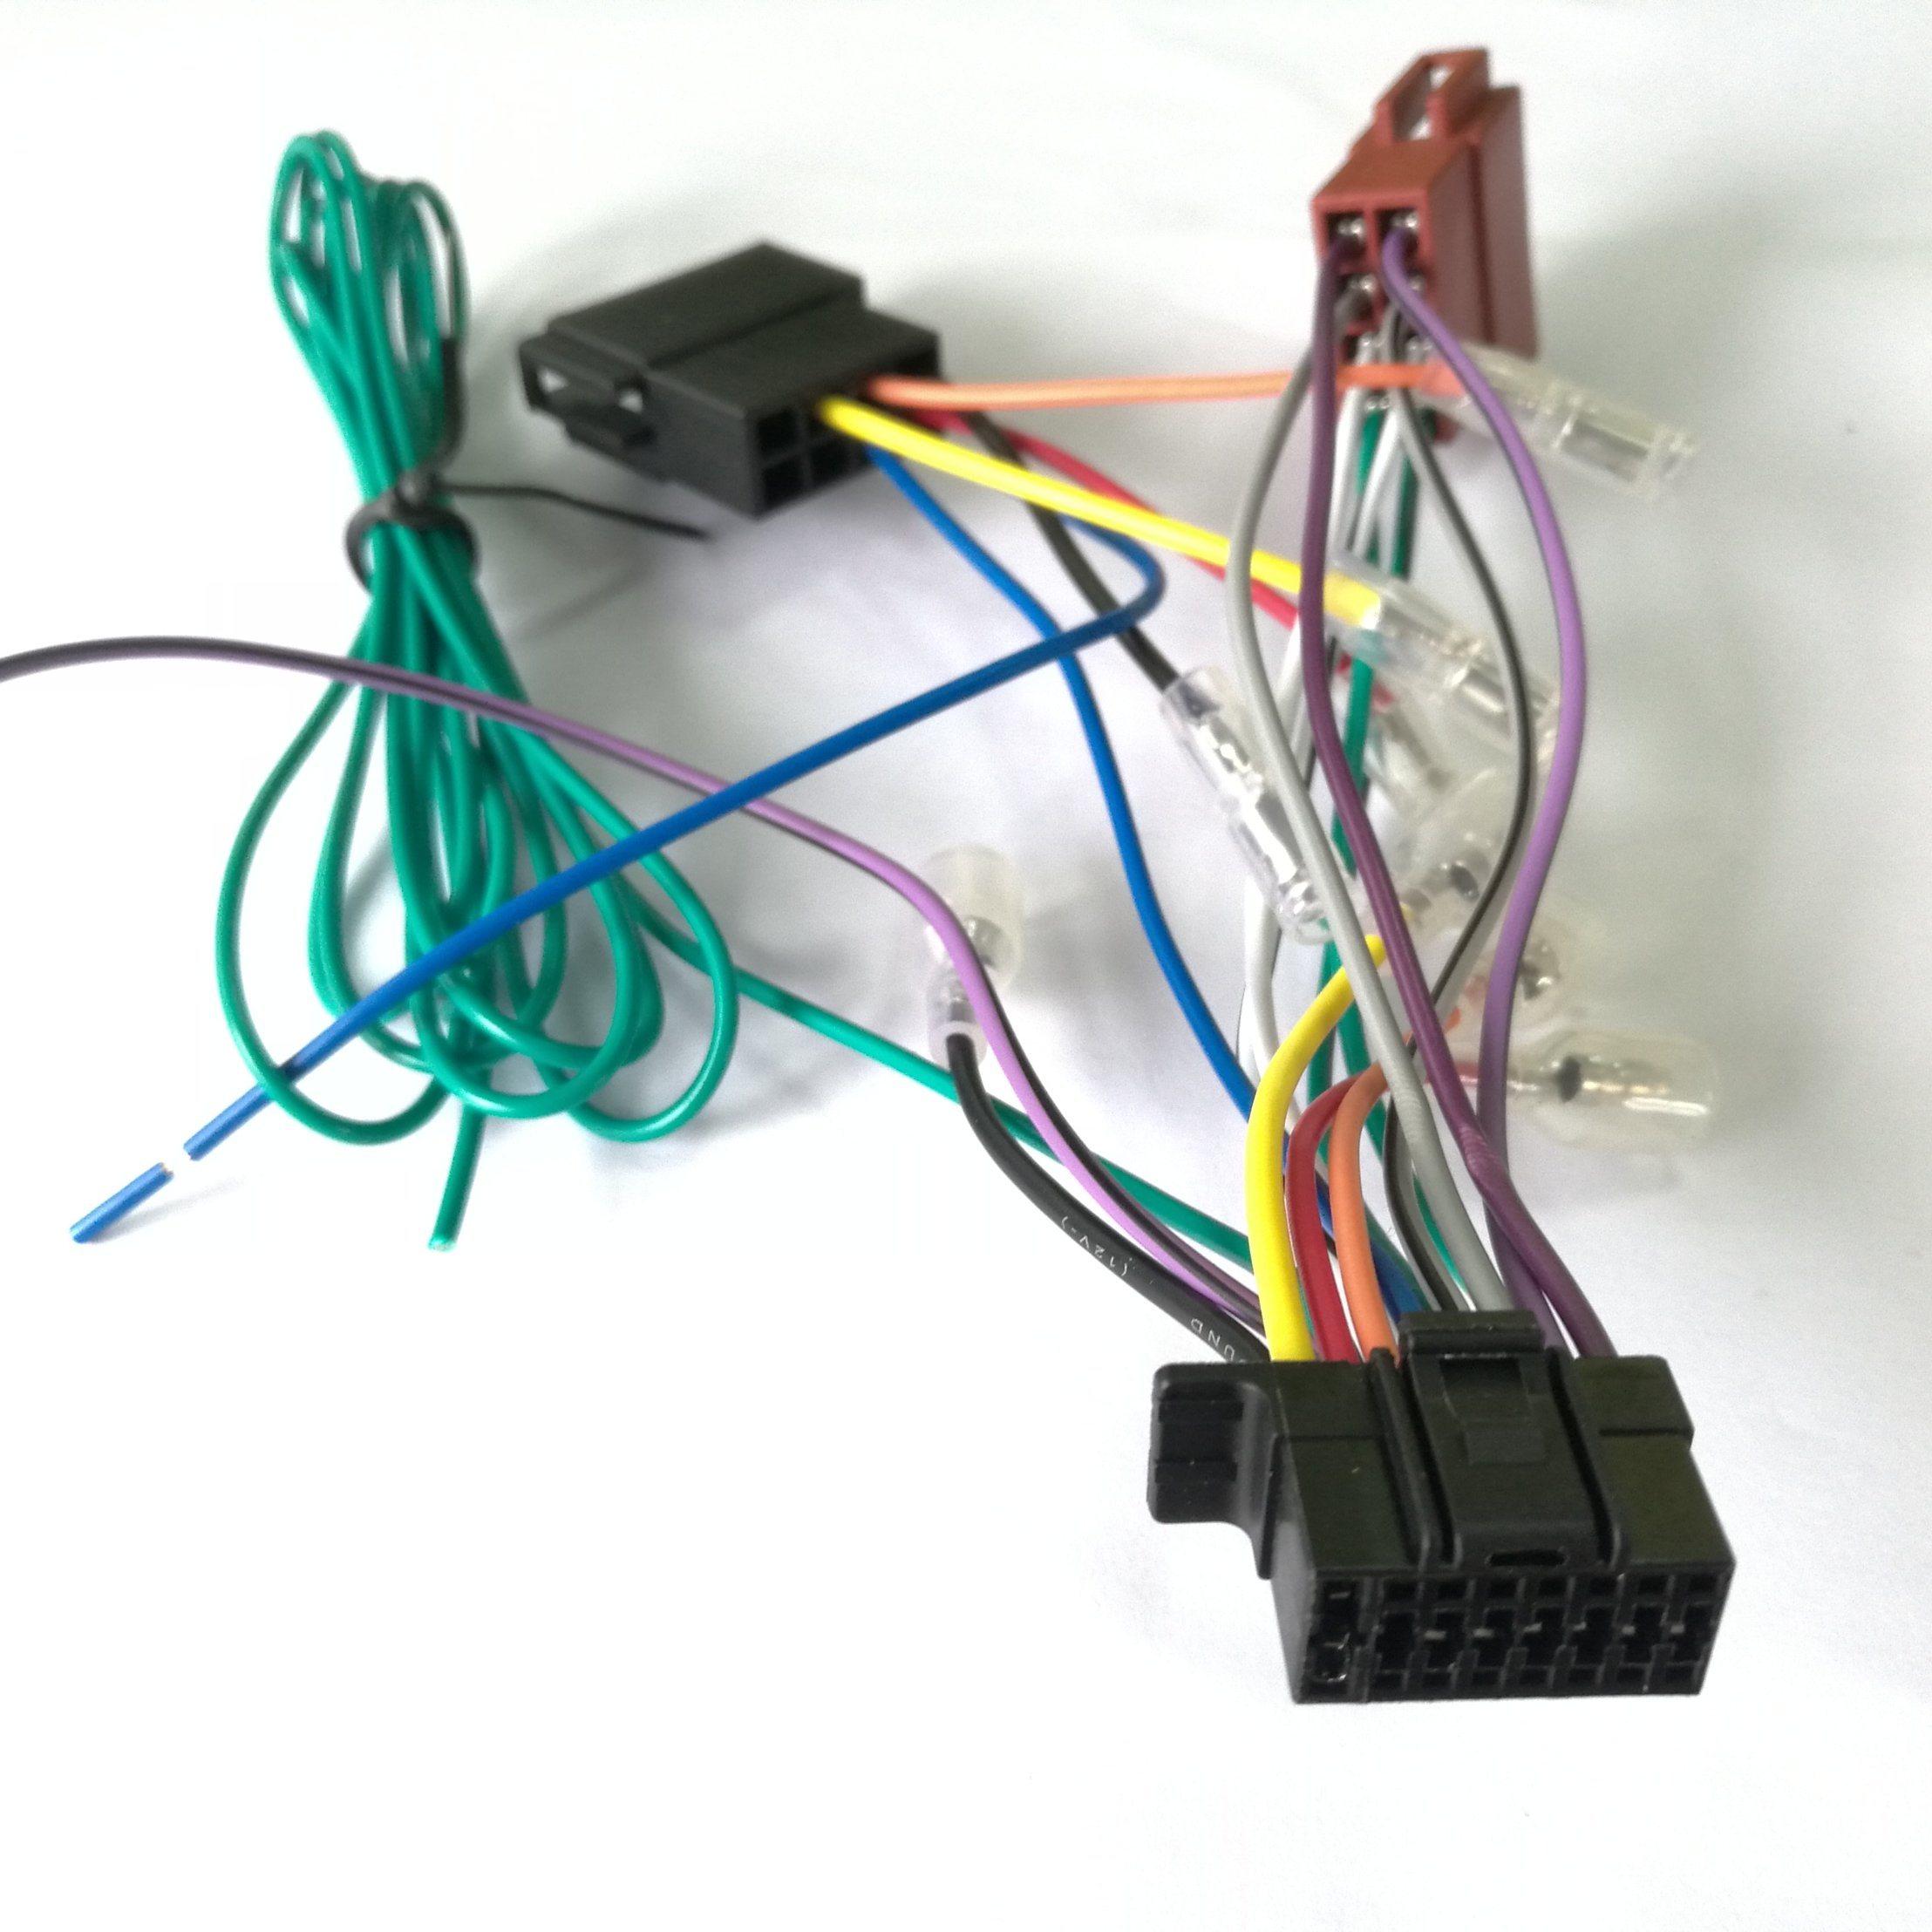 [Hot Item] Chrysler Voyager Honda Car Stereo Radio Wiring Harness  on